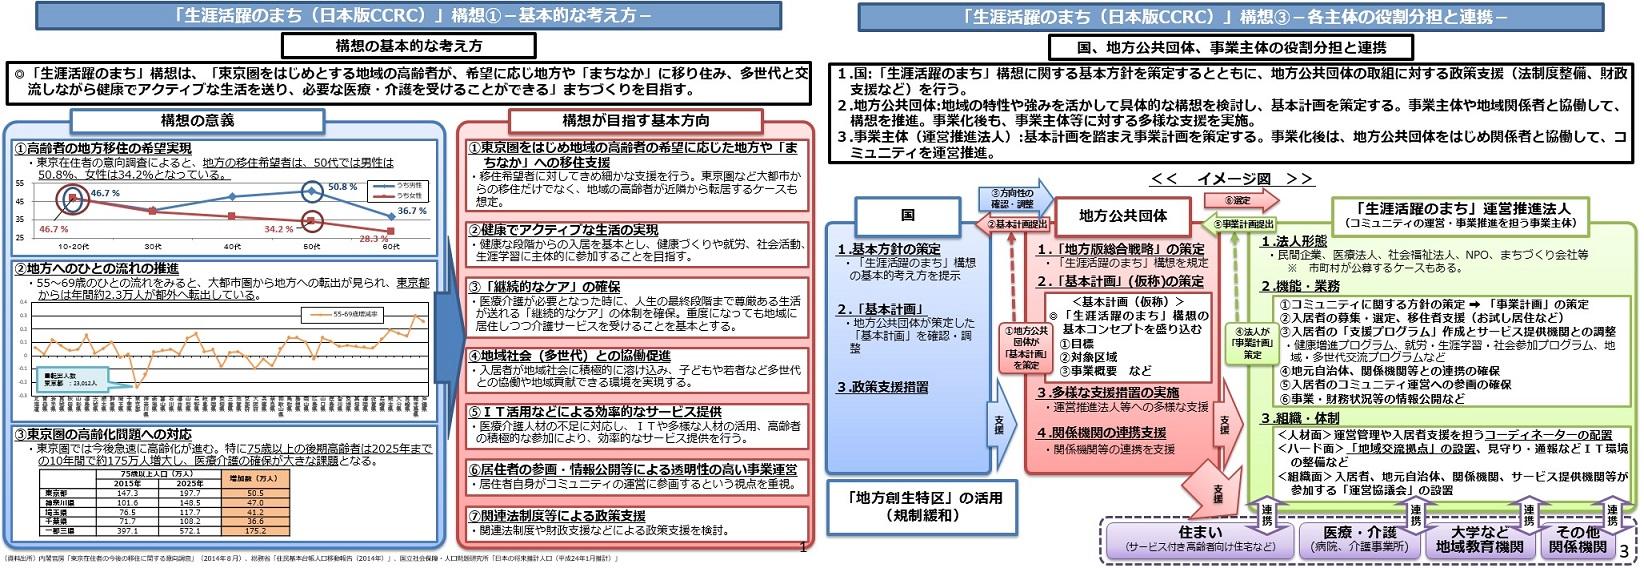 日本版CCRC構想中間報告と医療事故調査制度に係る指針_b0115629_21273428.jpg